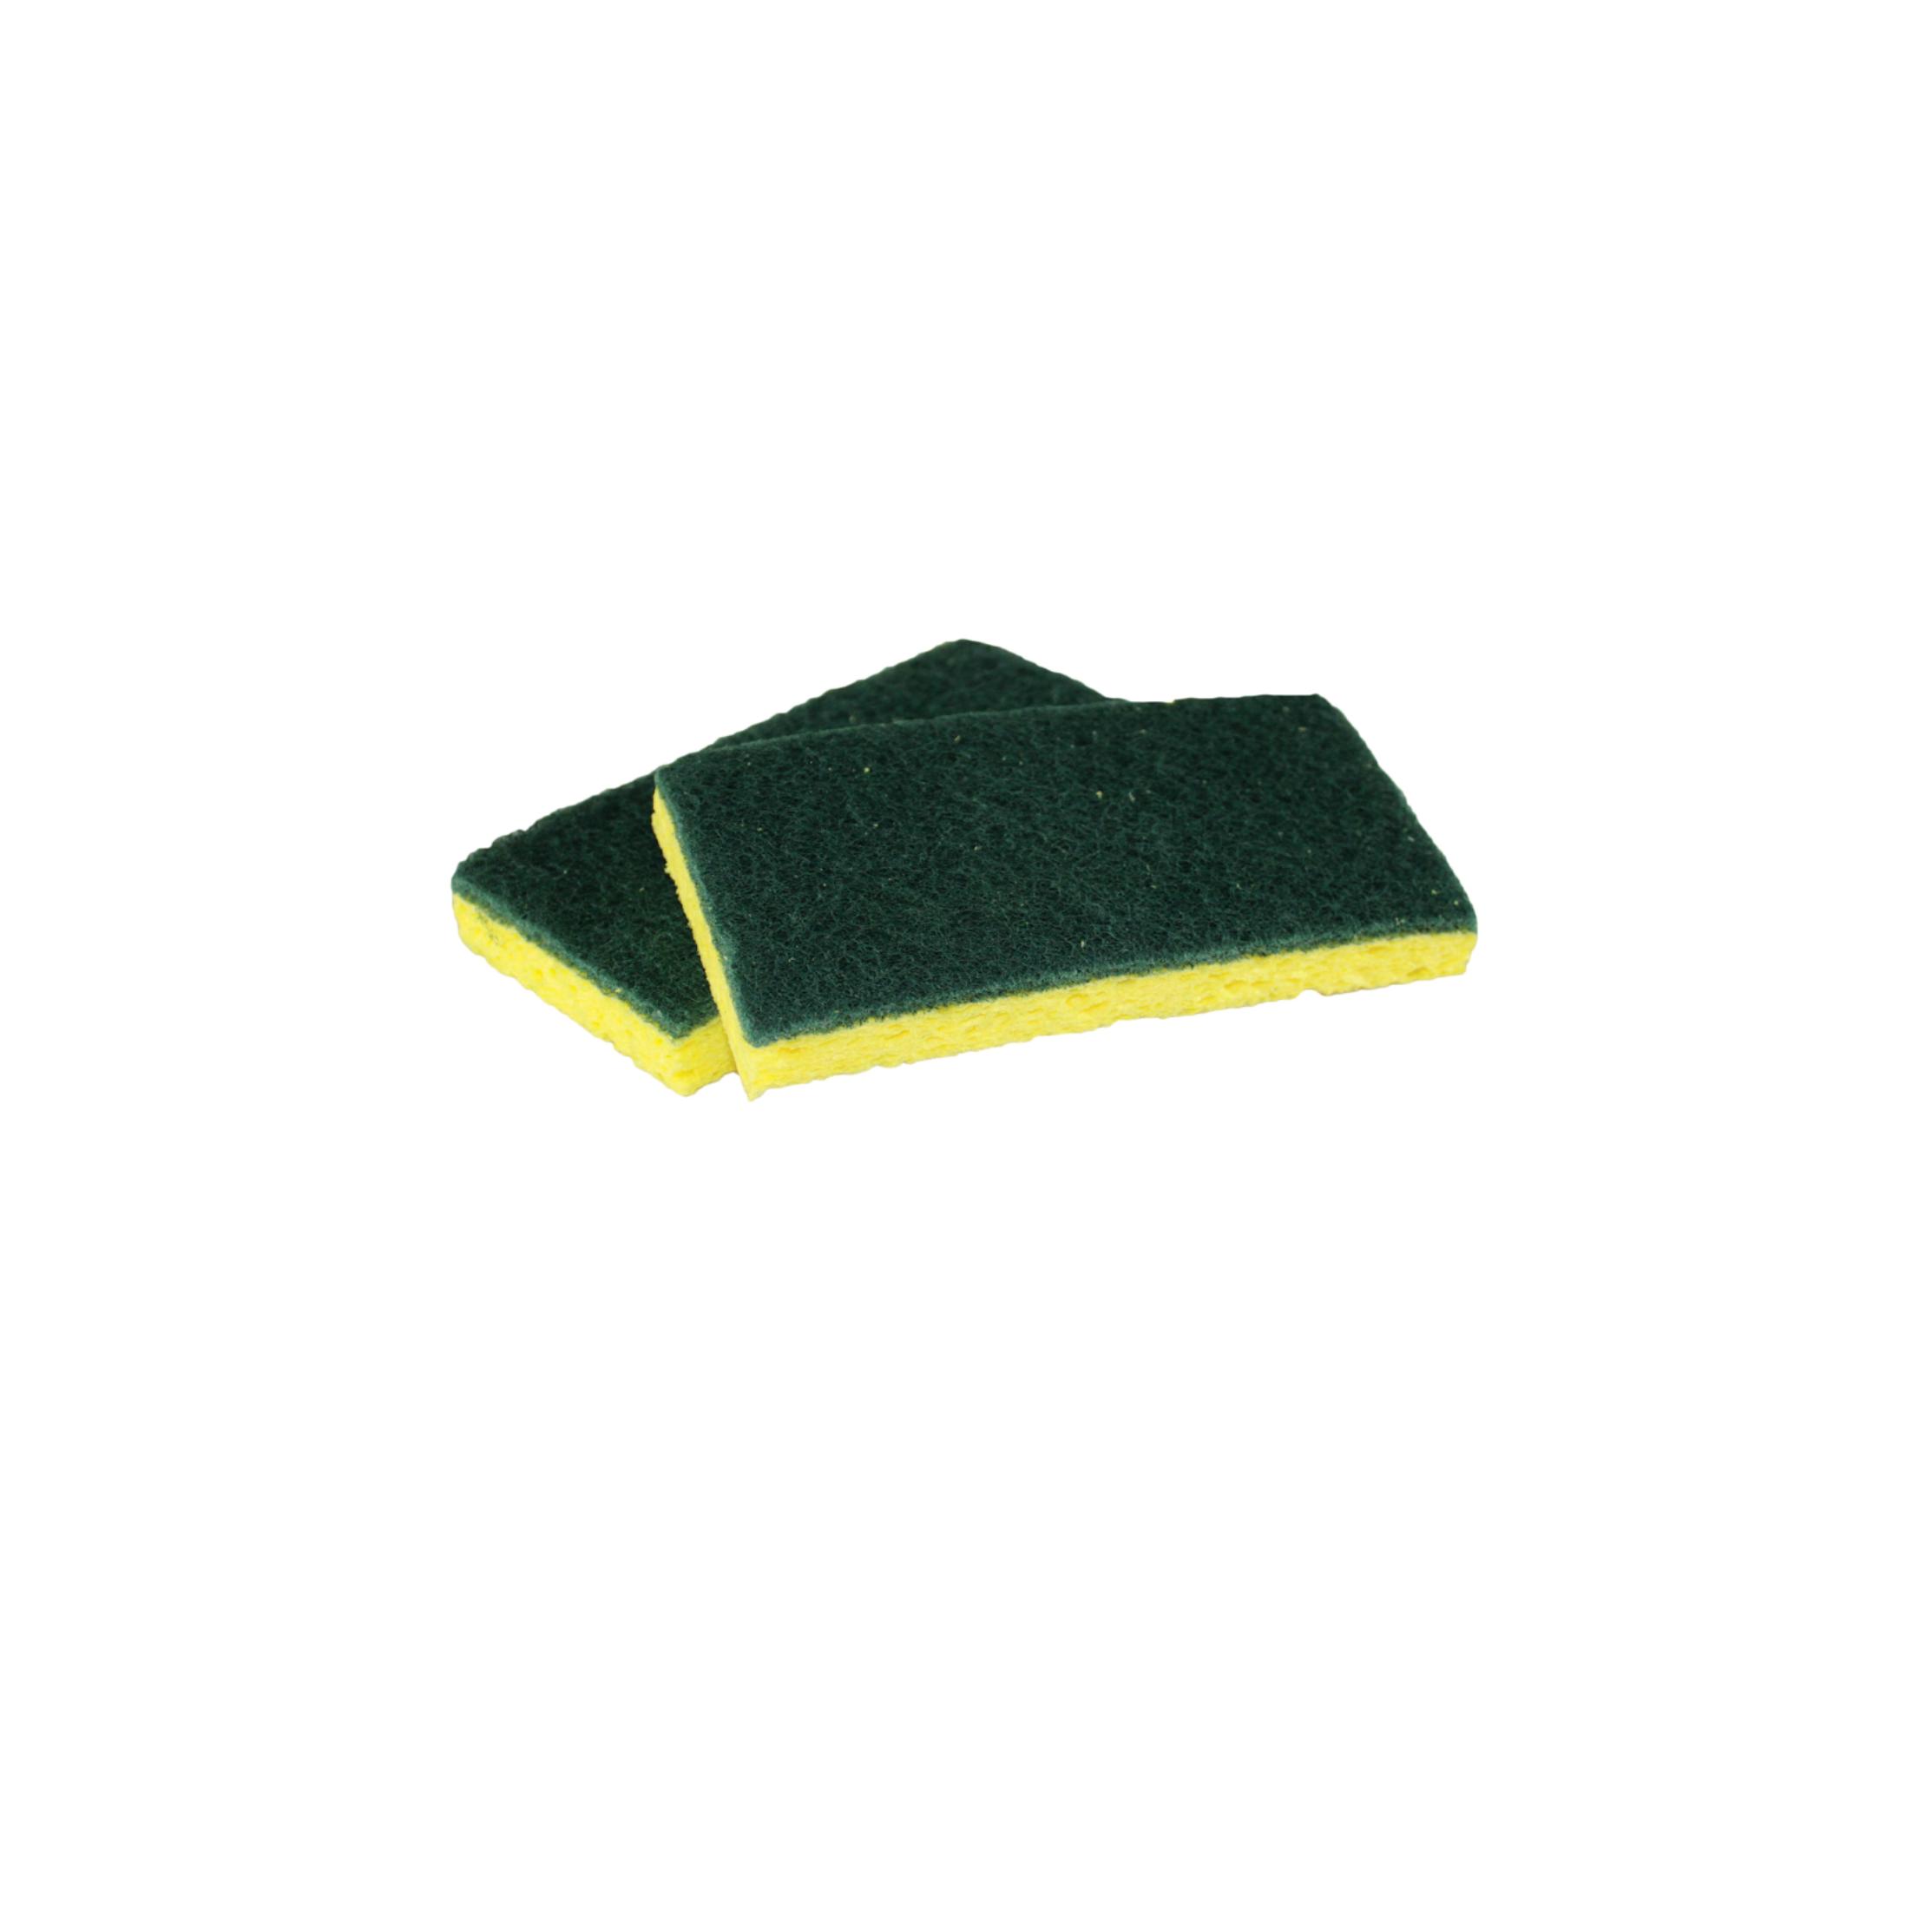 3000-04 Scrubber Sponge